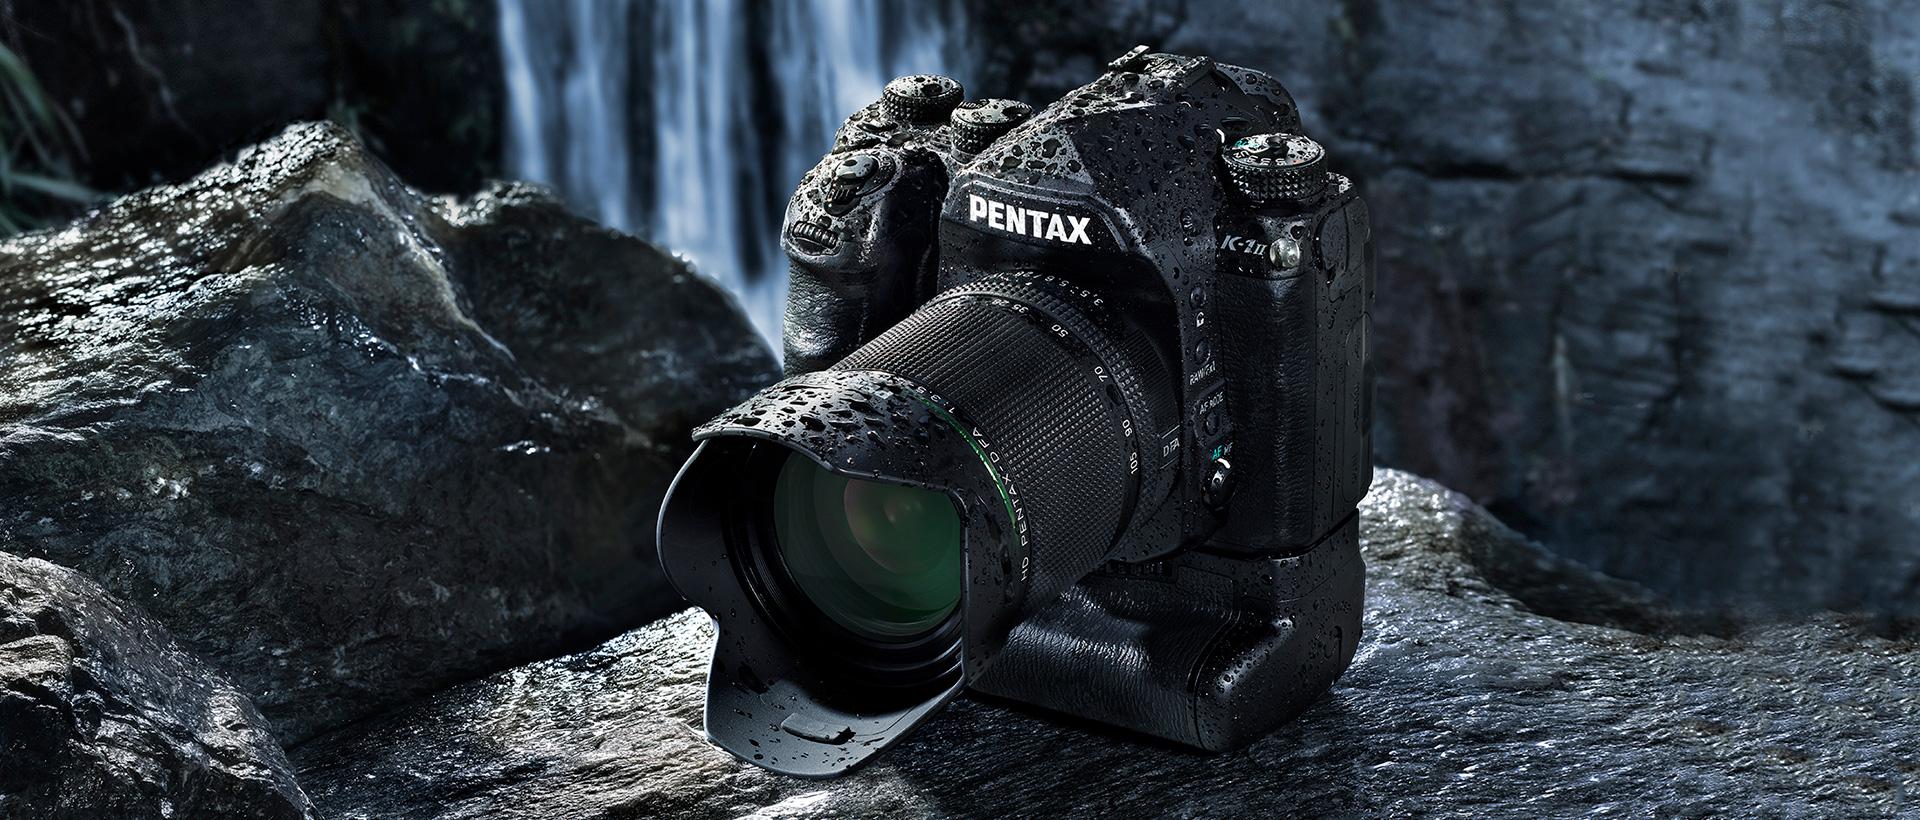 Pentax K System @ Photohaus.de